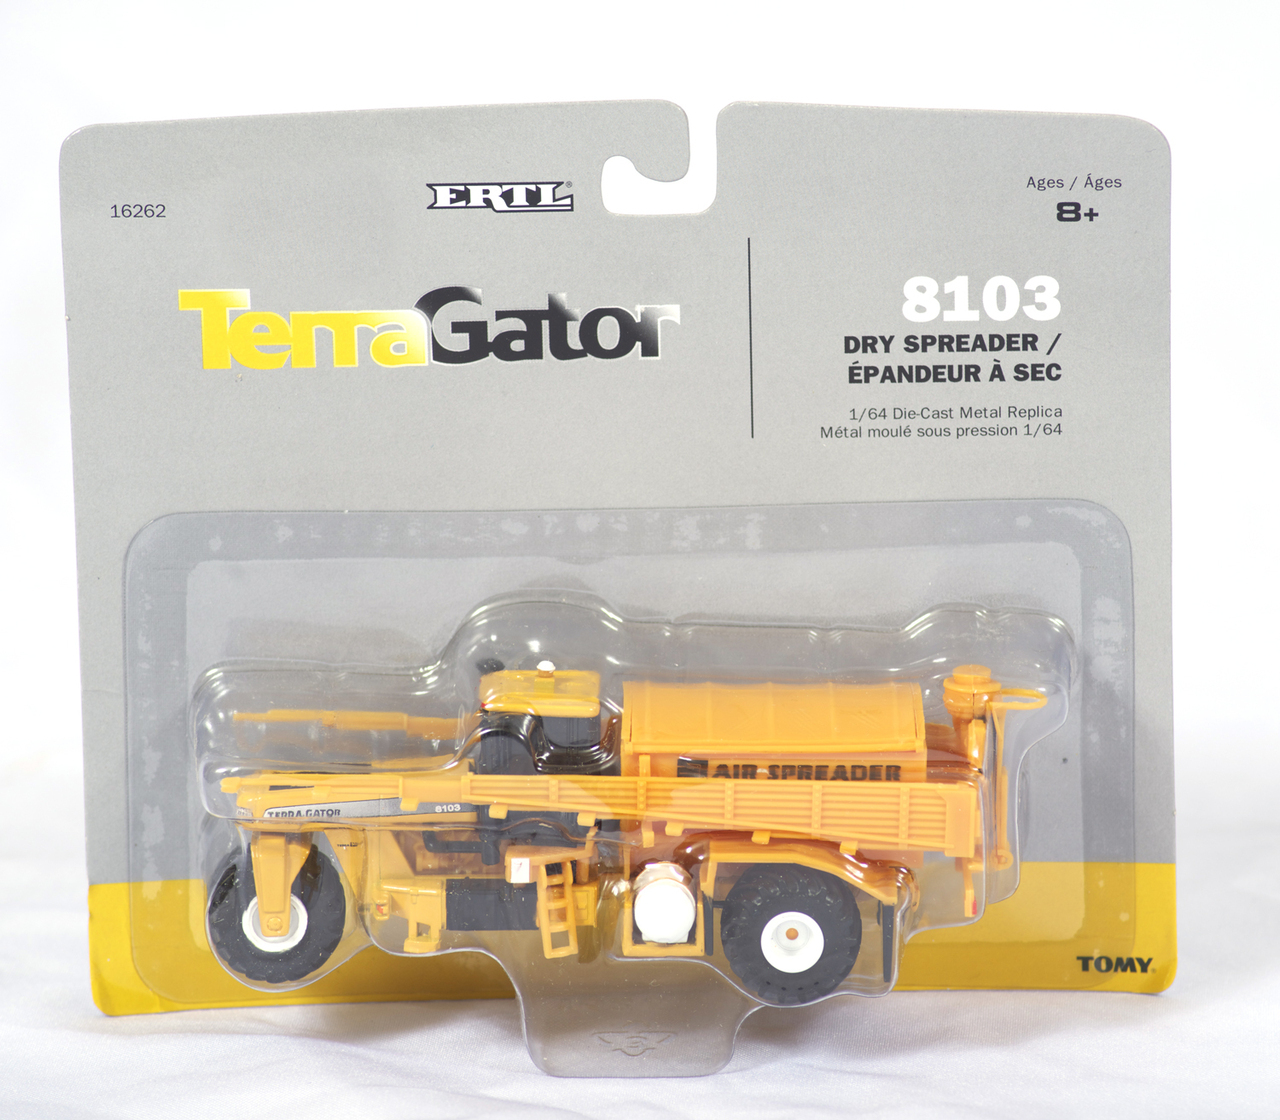 Speaking, Terra gator toys